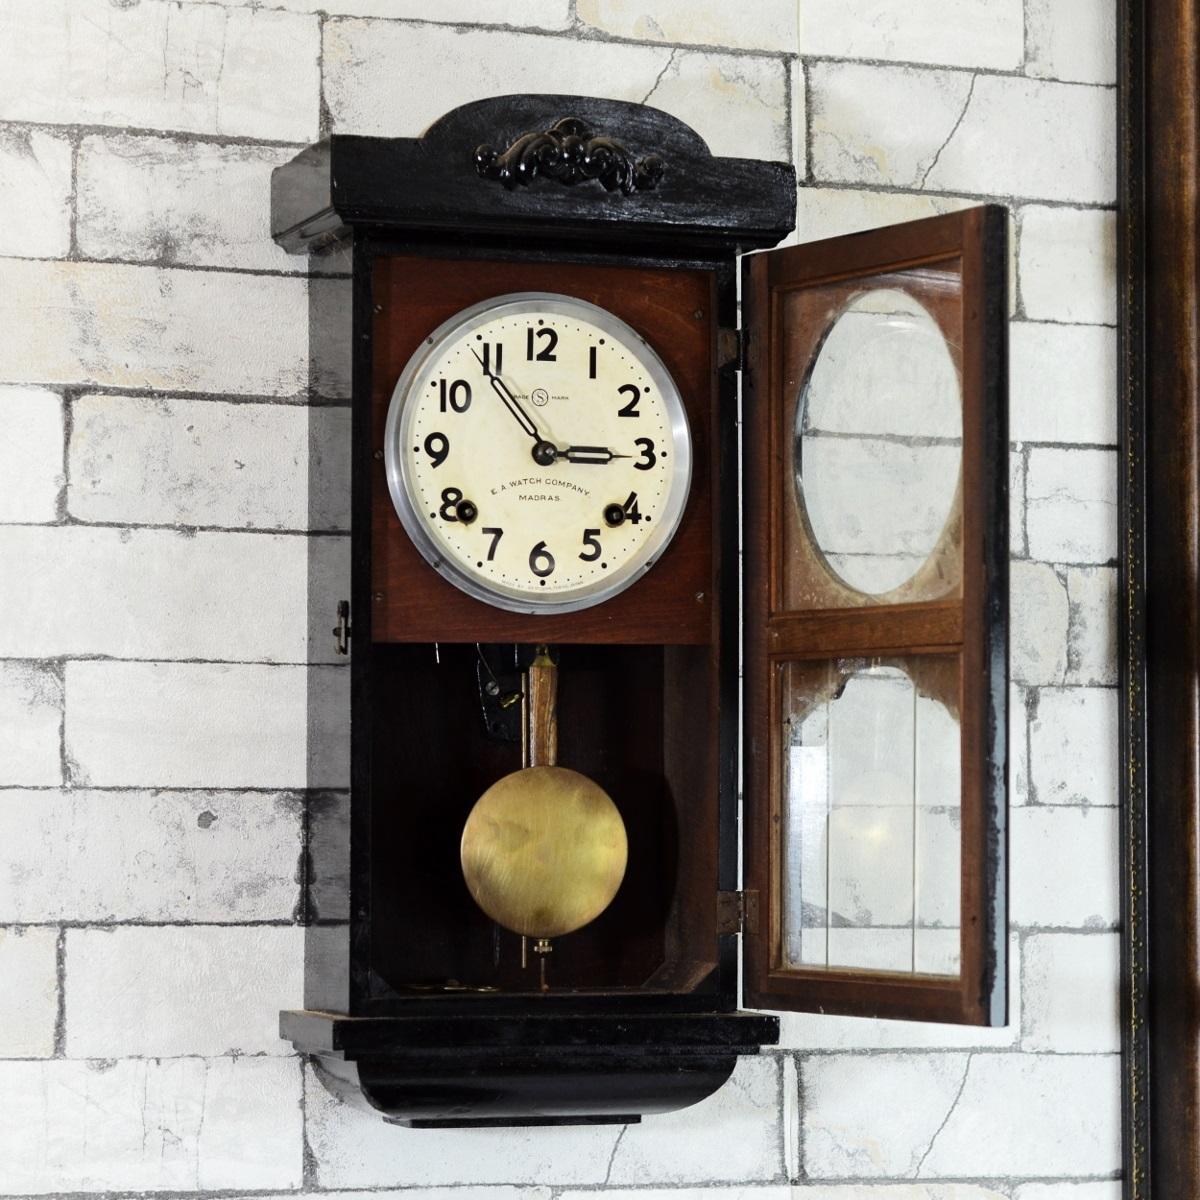 Seikosha Mini Tower 1940 Pendulum Wall Clock Antikcart